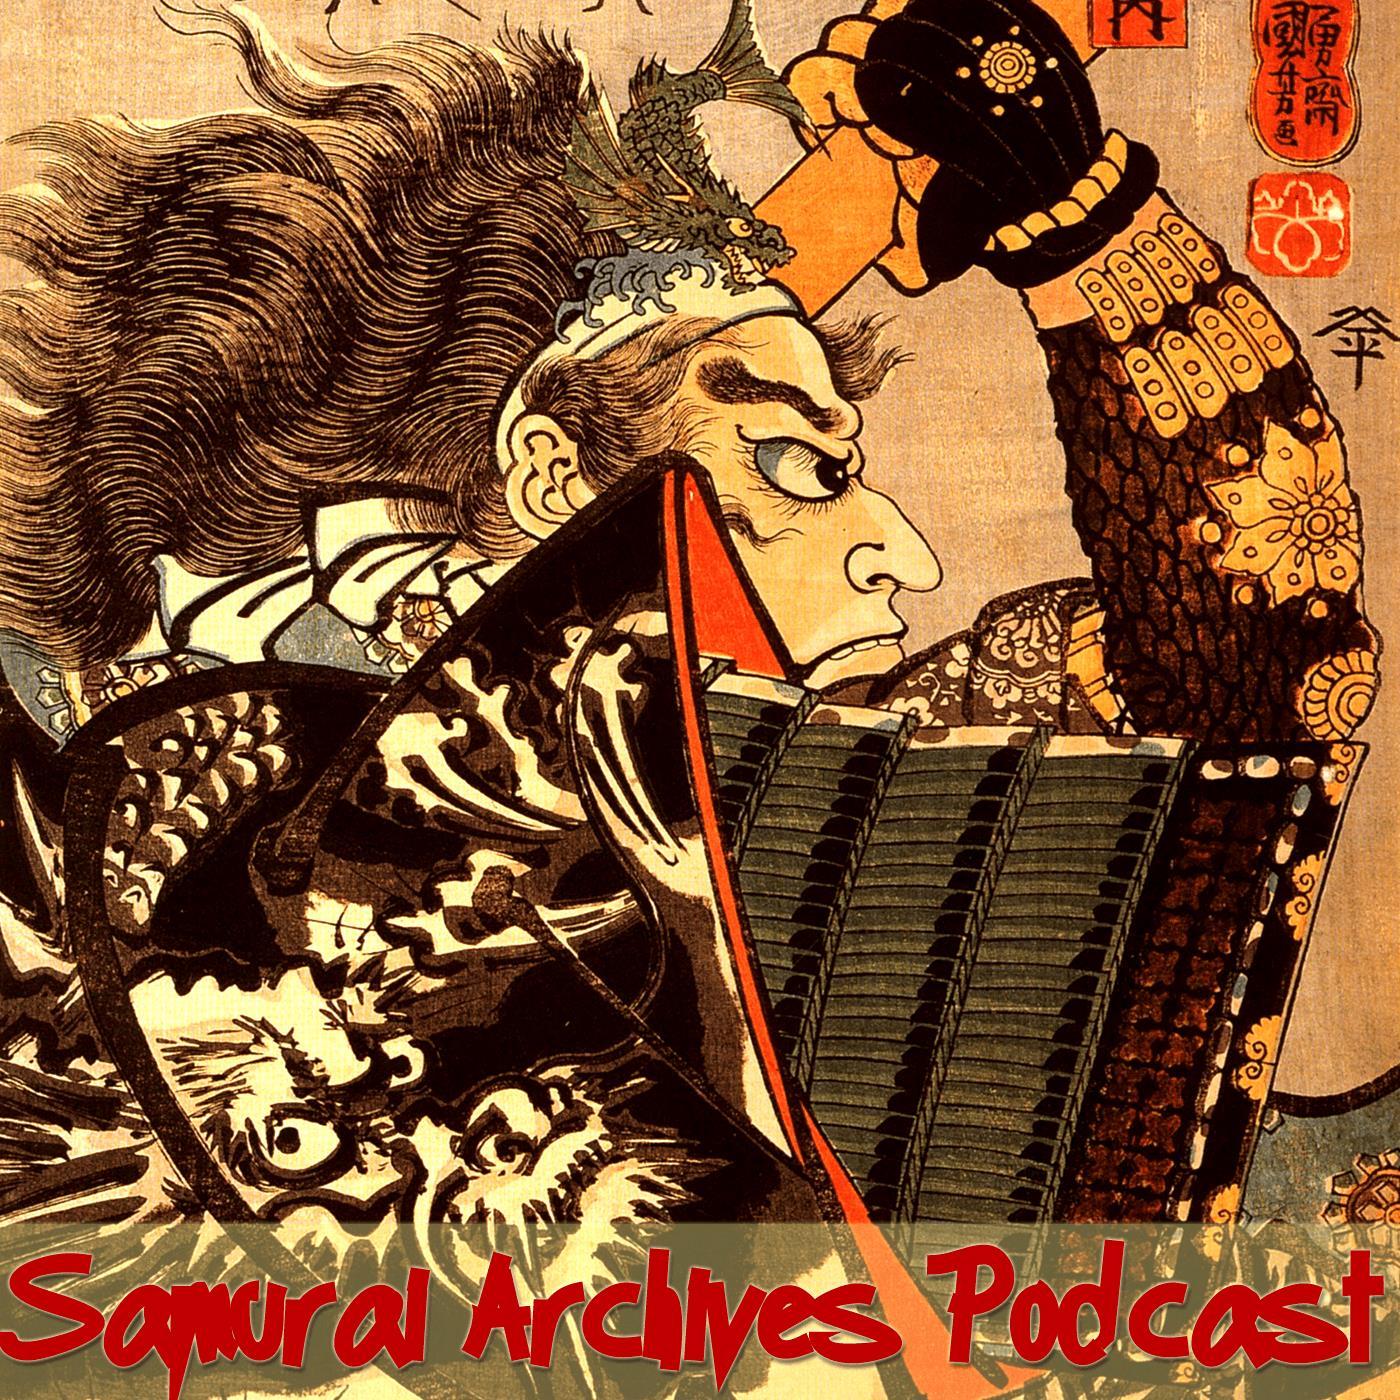 Samurai Archives Japanese History Podcast show art